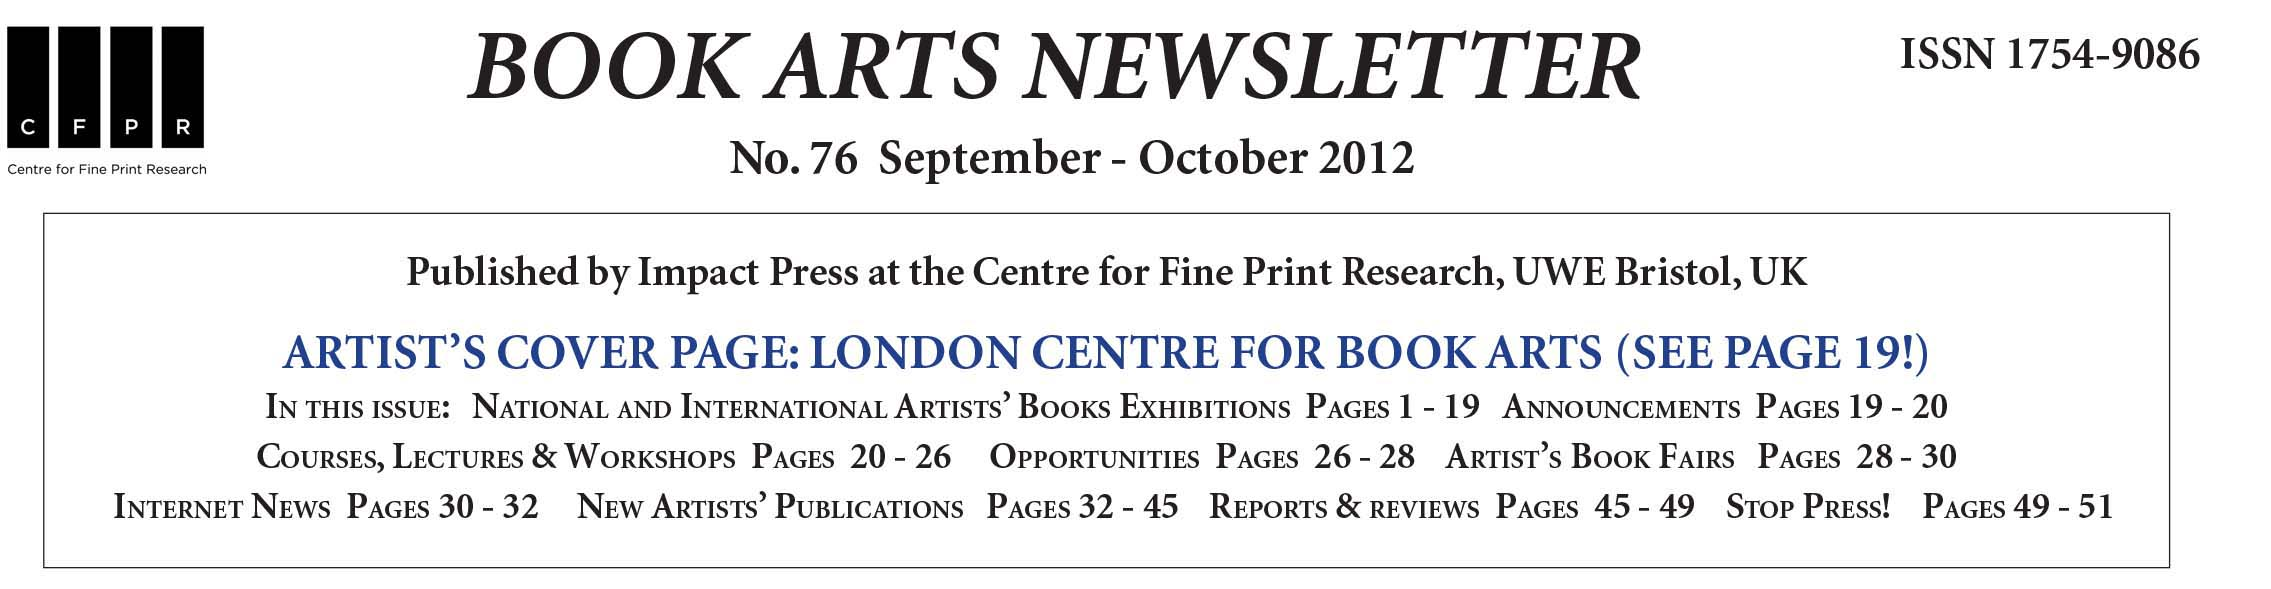 Book arts newsletter masthead.jpg